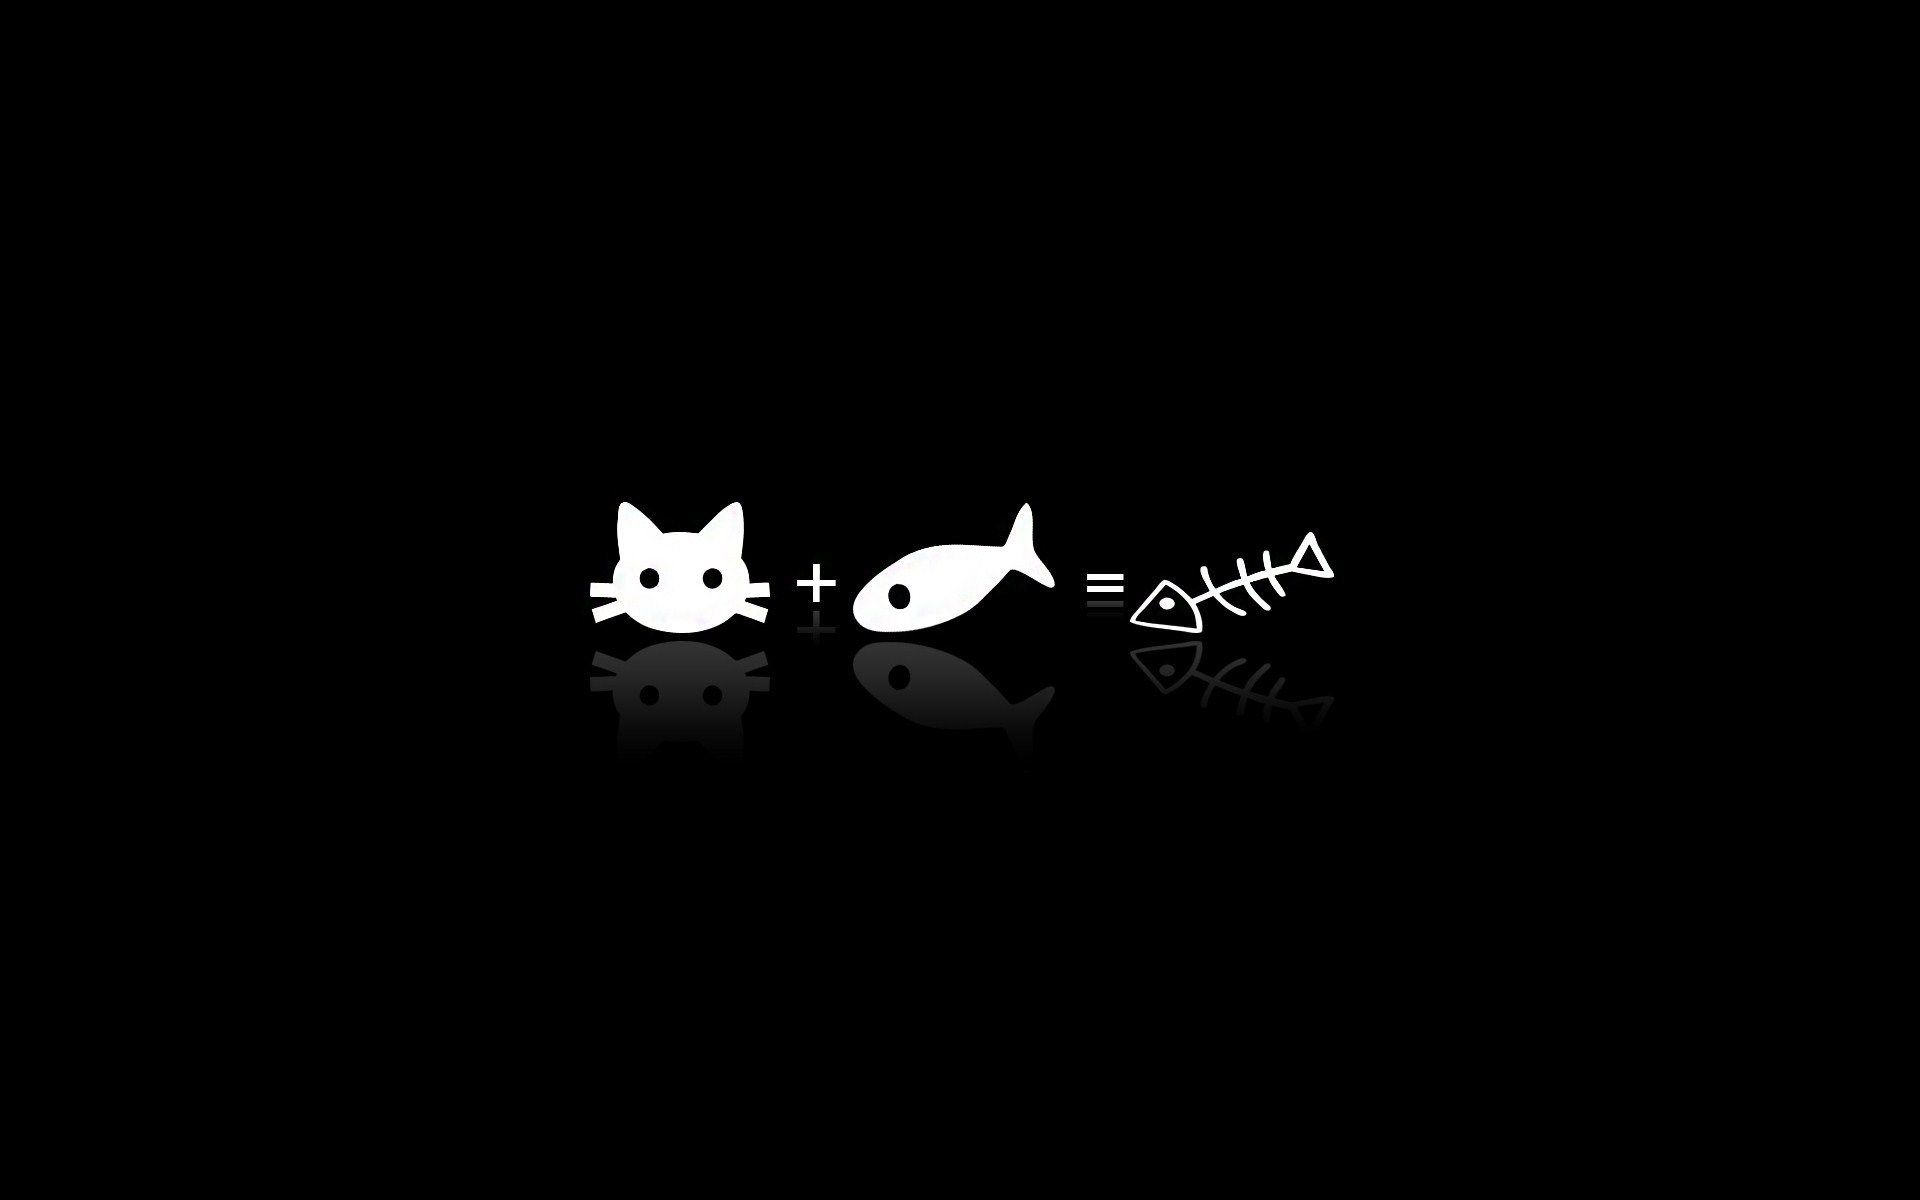 Hd Cartoon Cat Wallpapers Cute Black Wallpaper Desktop Wallpaper Black Aesthetic Tumblr Backgrounds